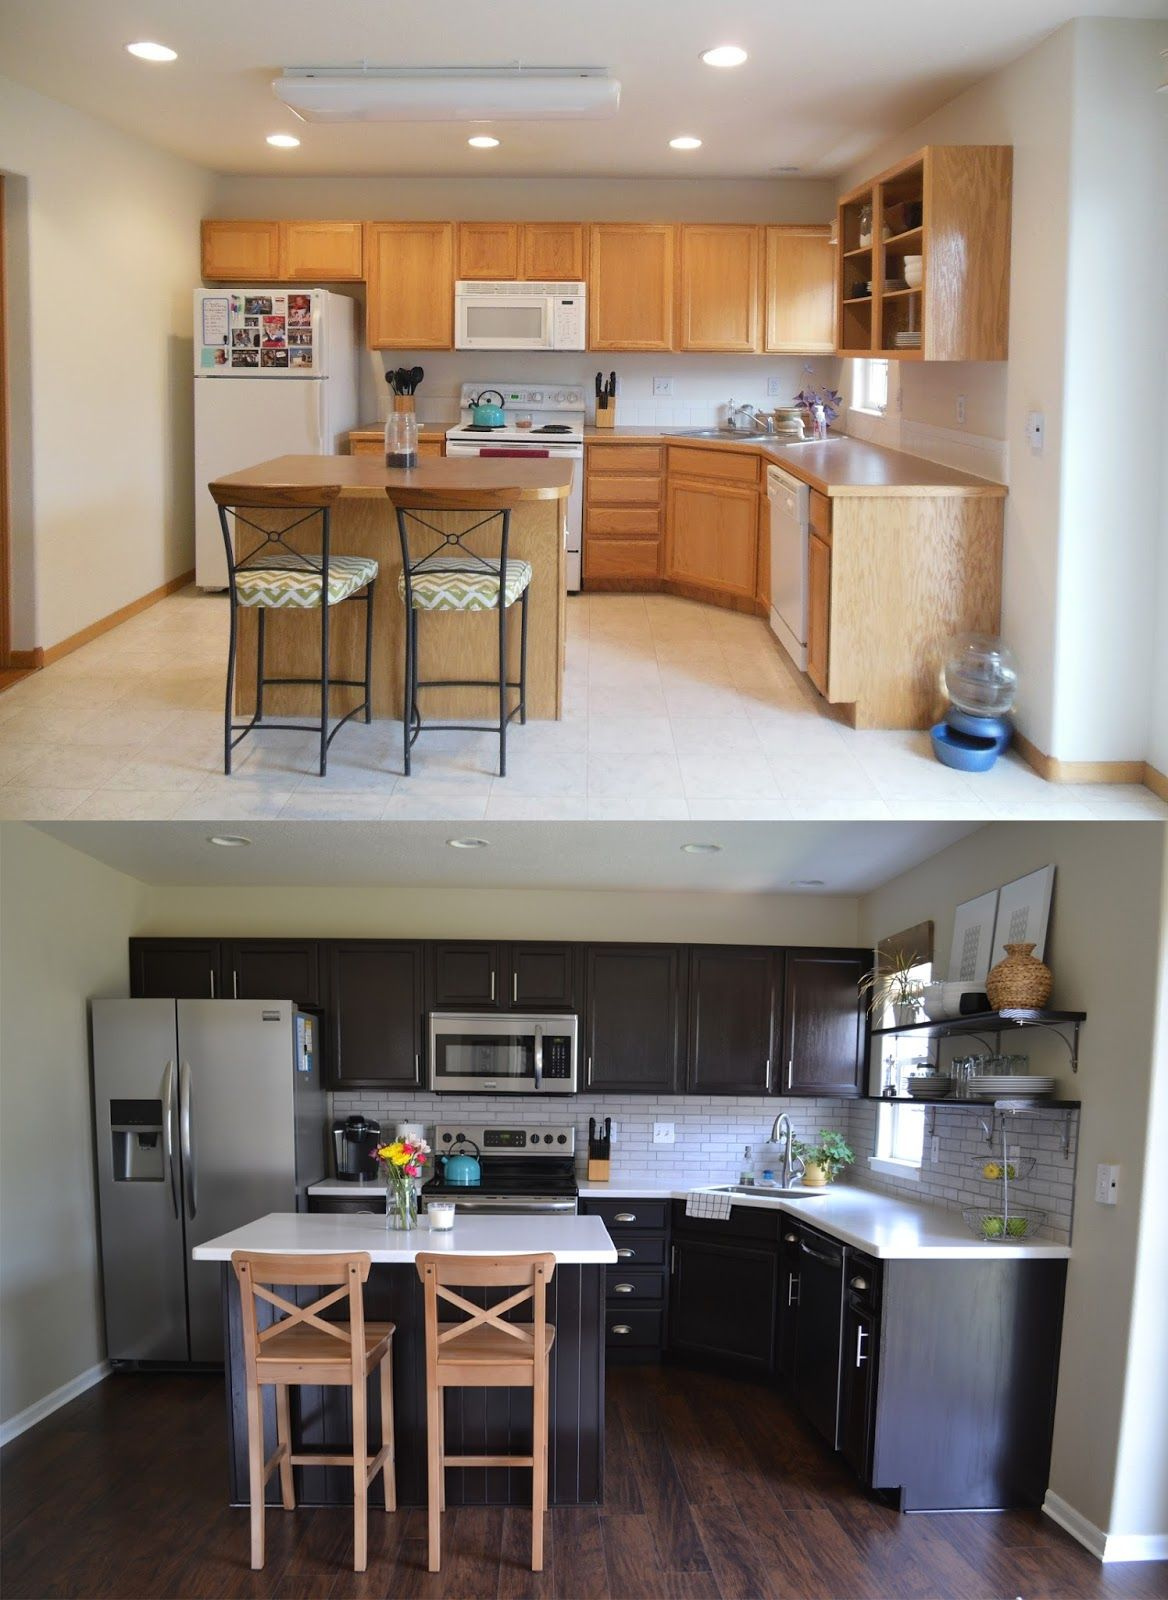 Kitchen Reveal: Before & After | DIYs Crafts & Recipes | Pinterest ...